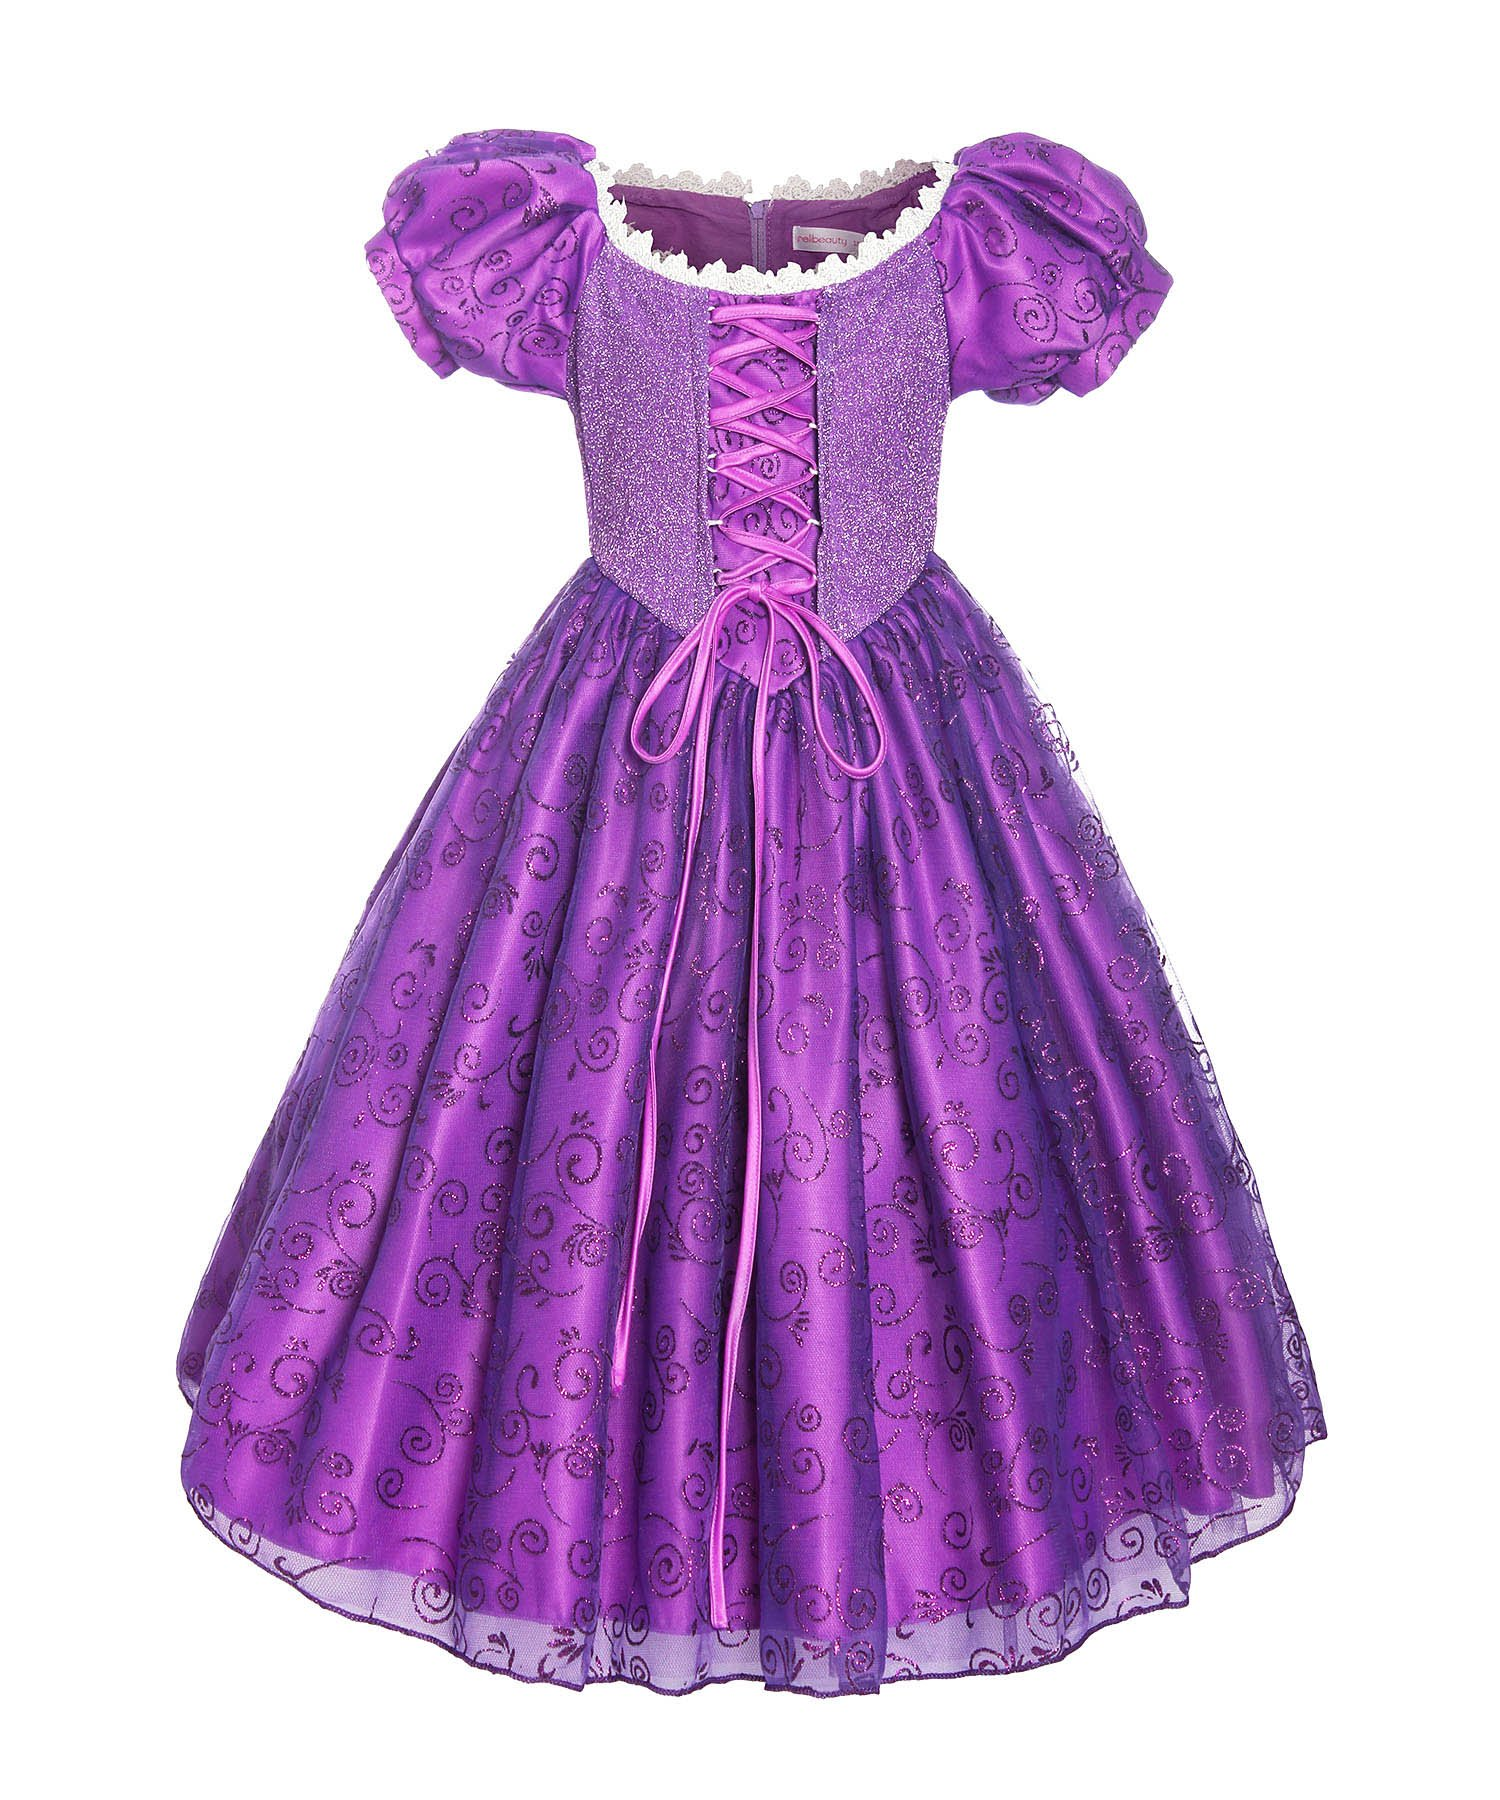 ReliBeauty Girls Princess Tangled Rapunzel Lace up Dress Costume, 2T-3T